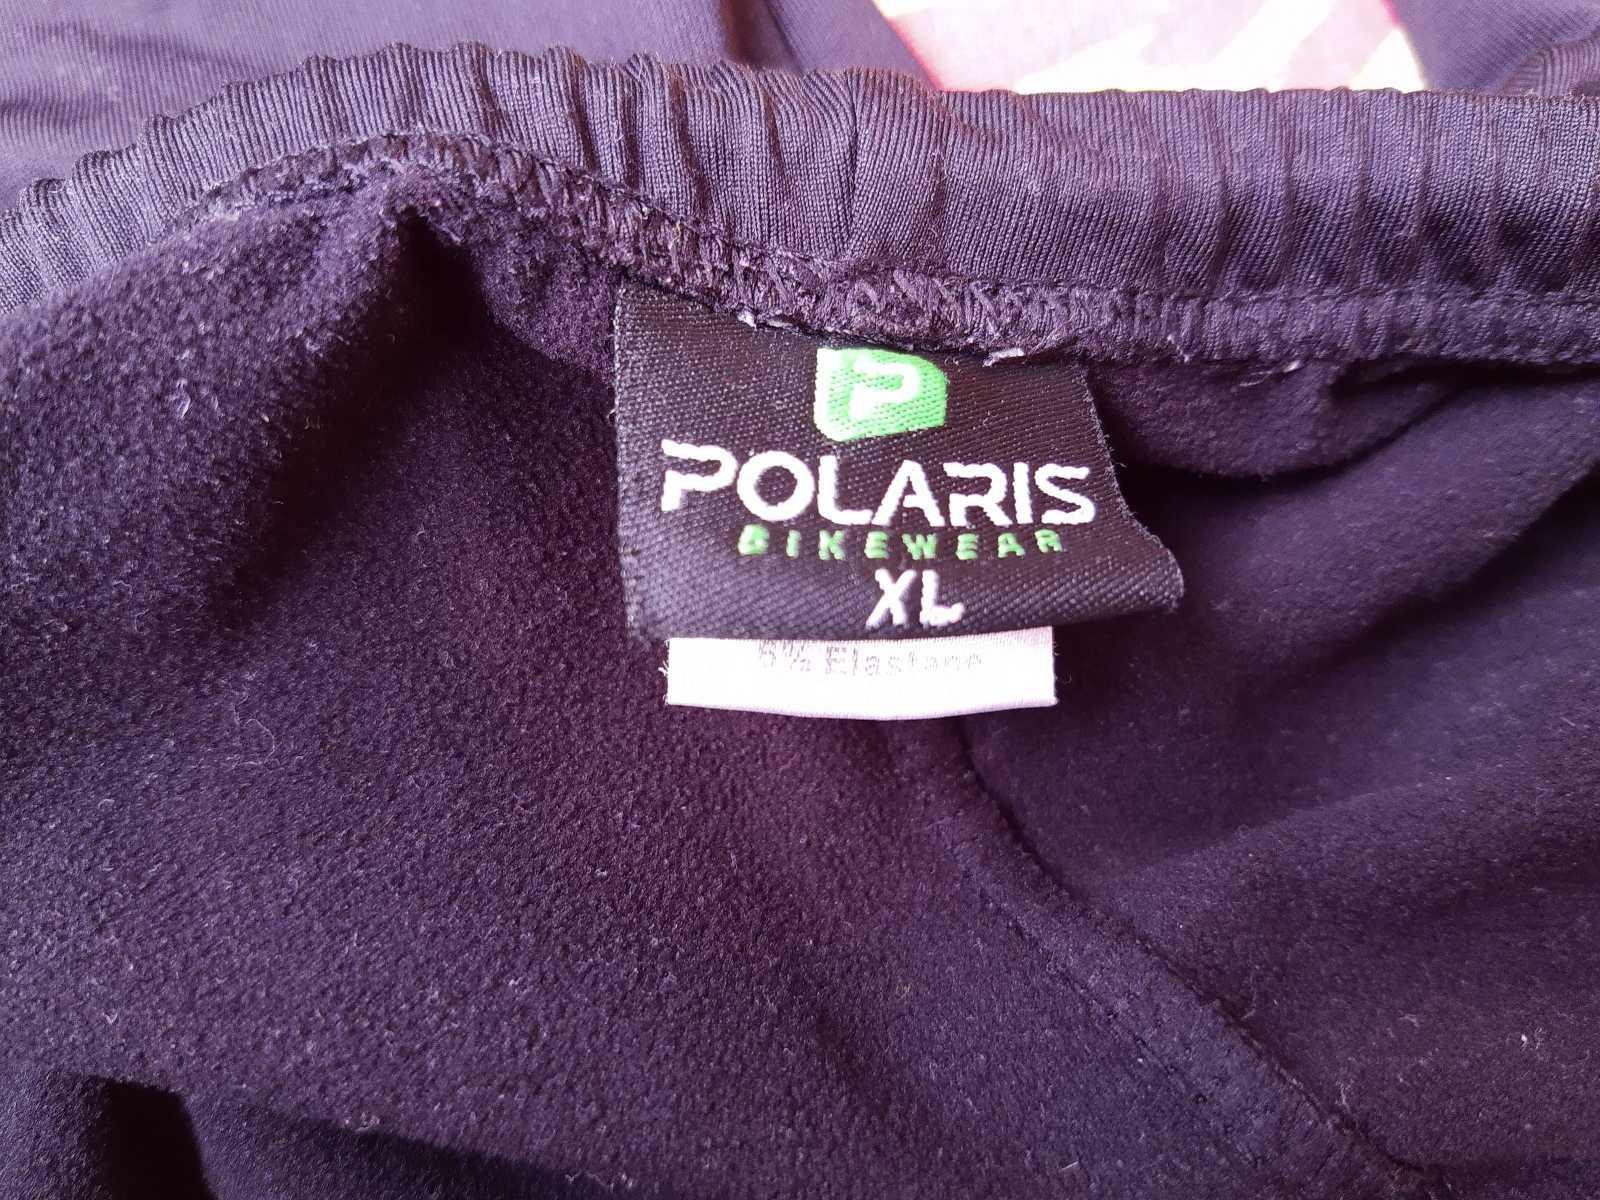 Штаны теплые Polaris, с флисом, без памперса